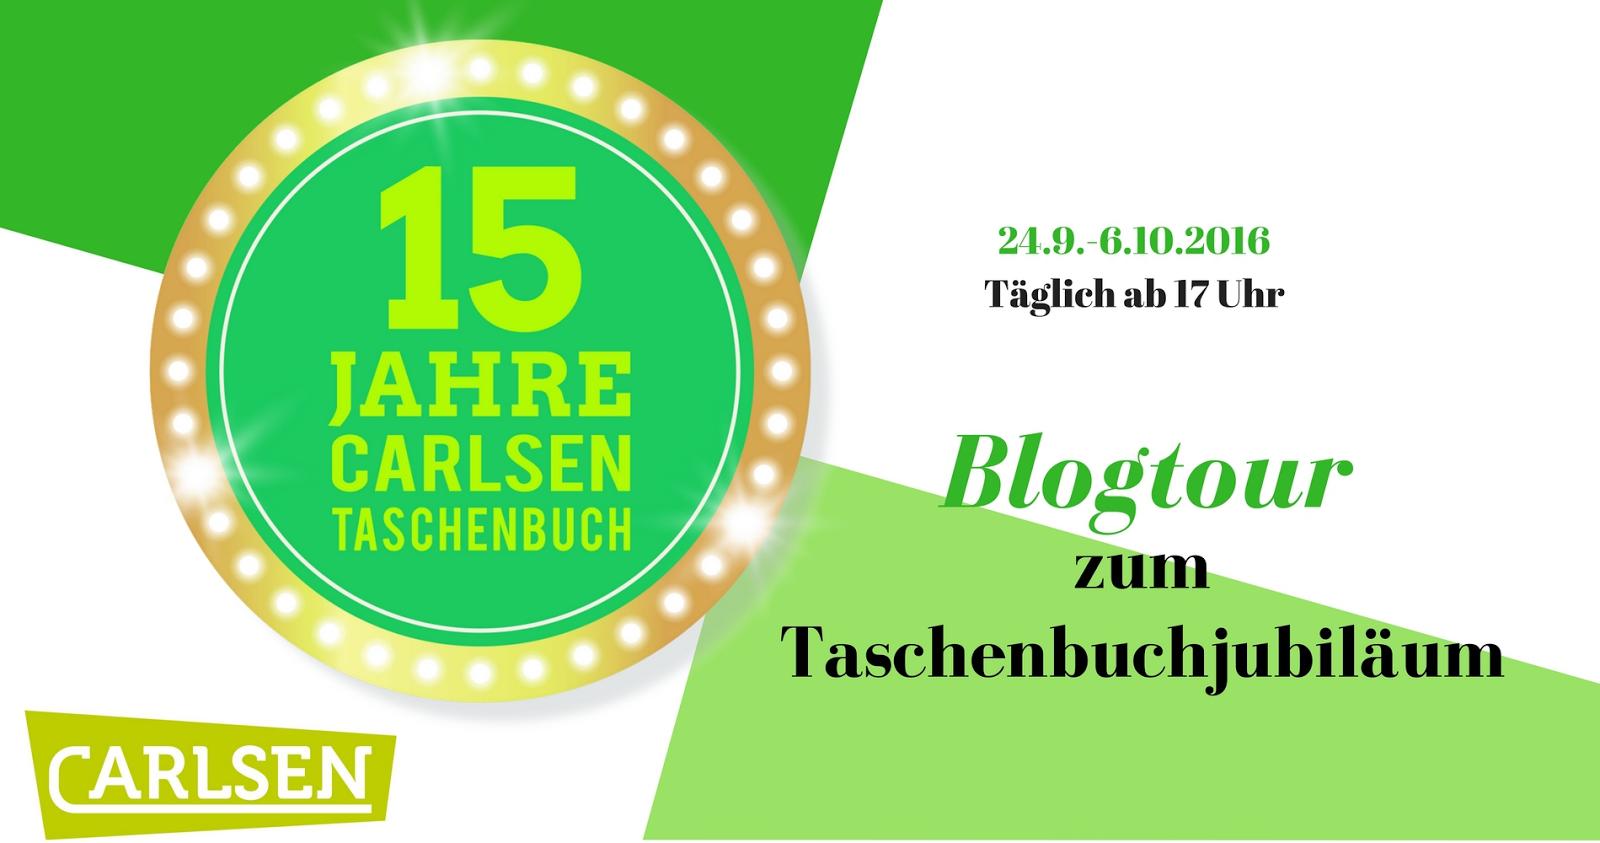 Blogtour 24.09. - 06.10.